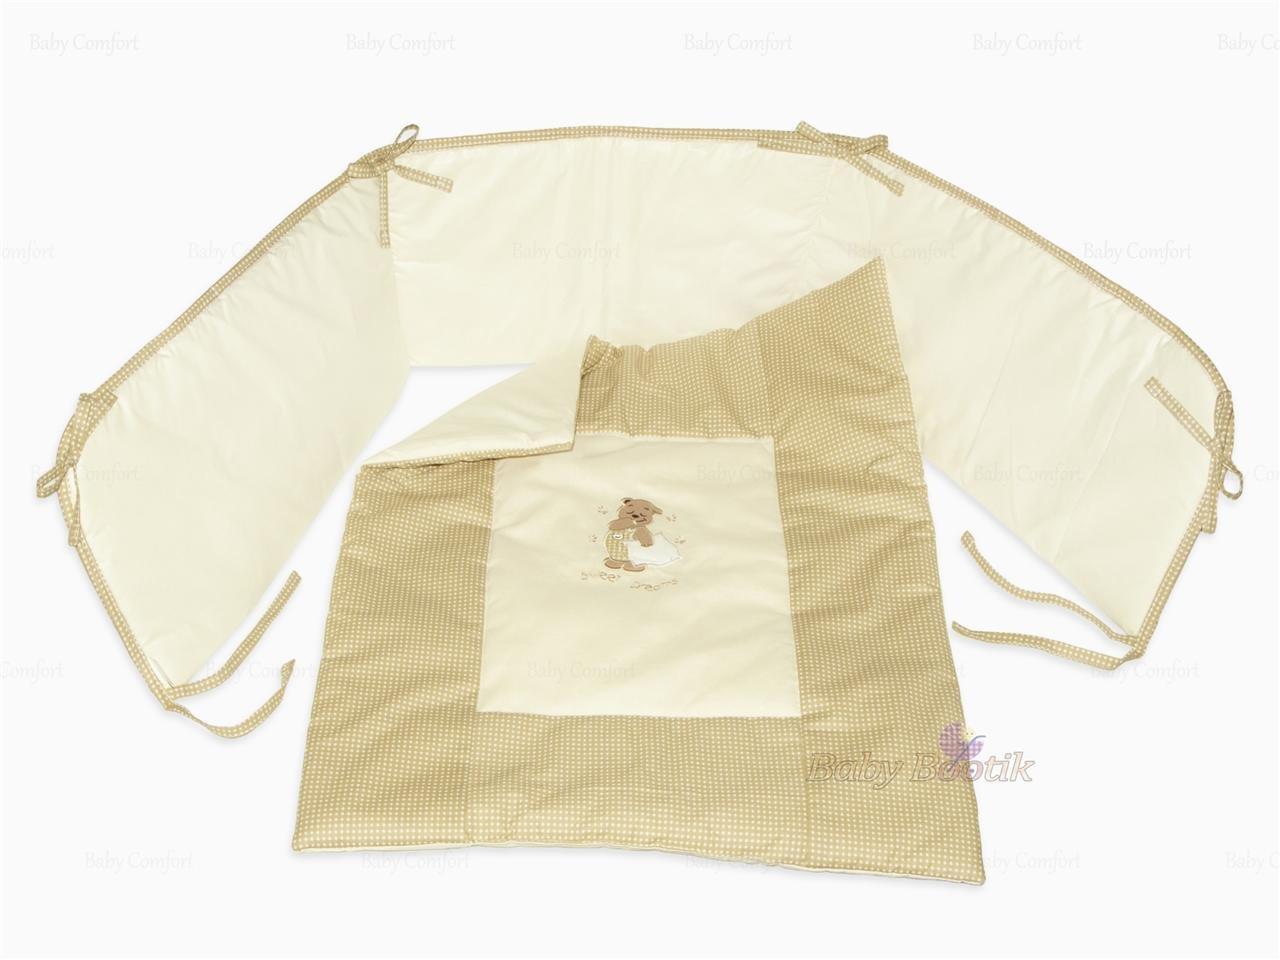 Cuna Bumper & Colcha –  2 pcs bordado Juego de ropa de cama, para adaptarse a para cuna (90 x 40 cm beige Colour Beige para adaptarse a para cuna (90x 40cm beige Colour Beige BabyComfort